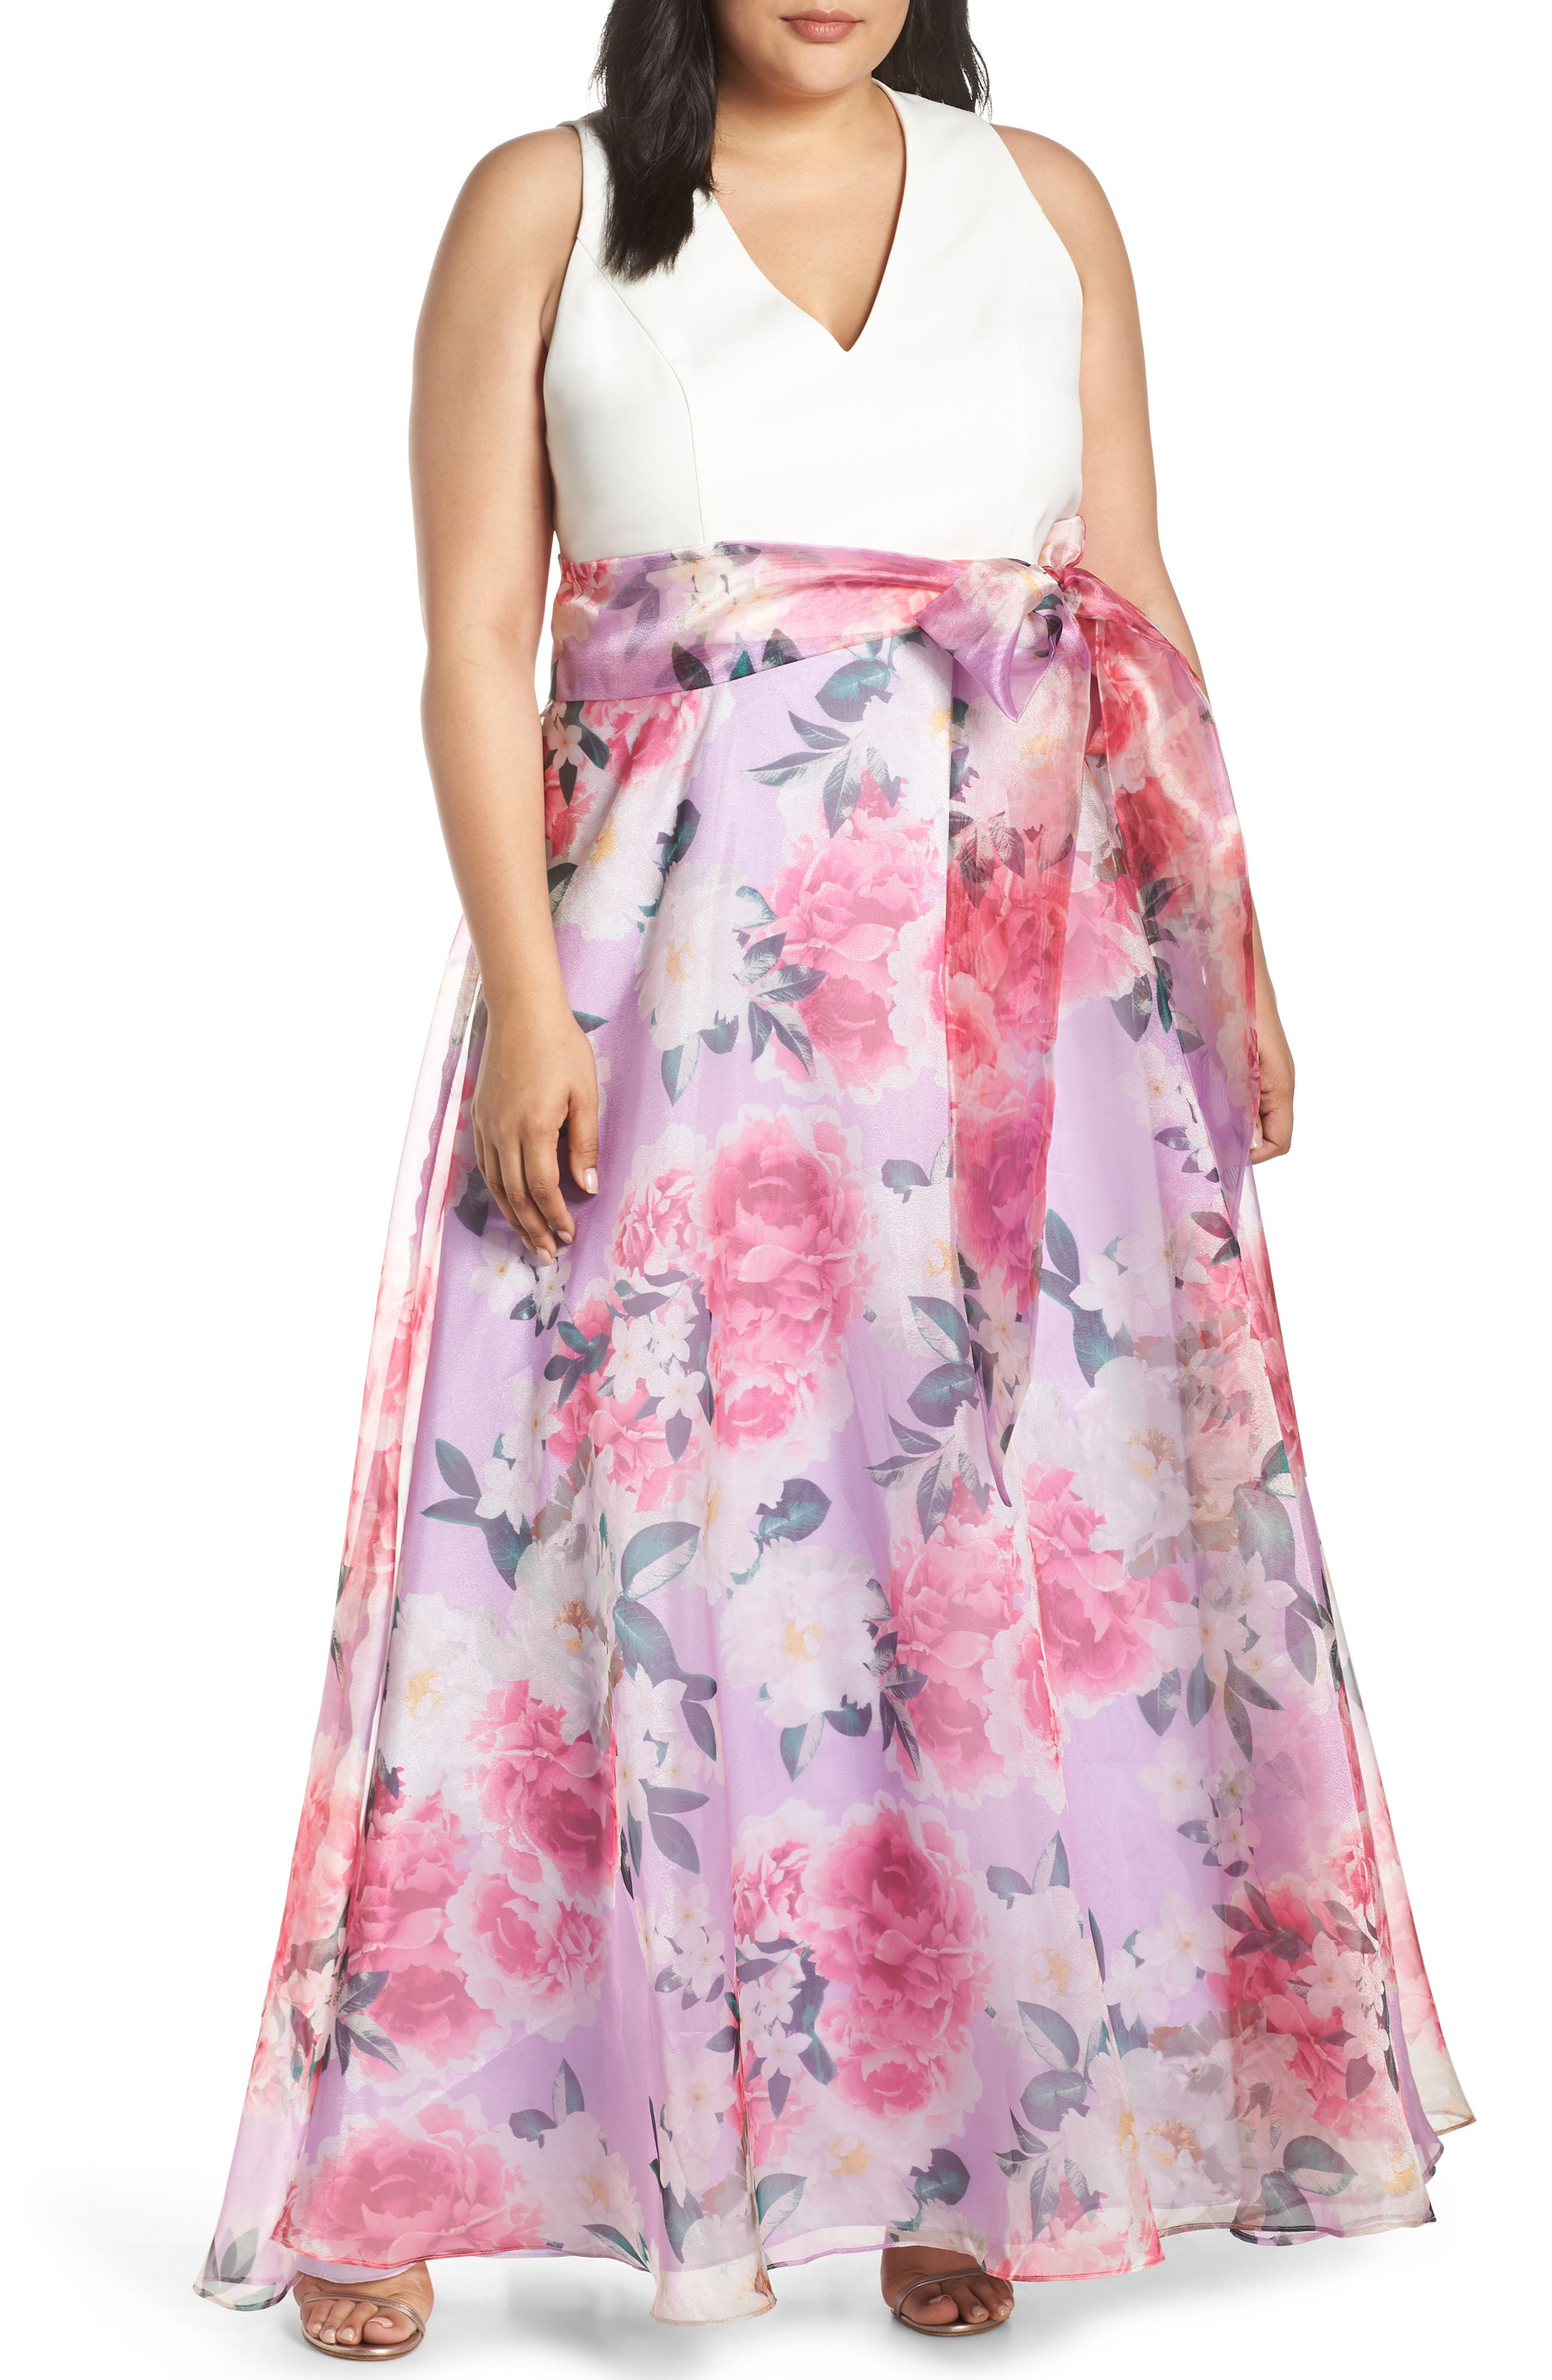 Plus Size Eliza J Floral Chiffon Evening Dress, Ivory